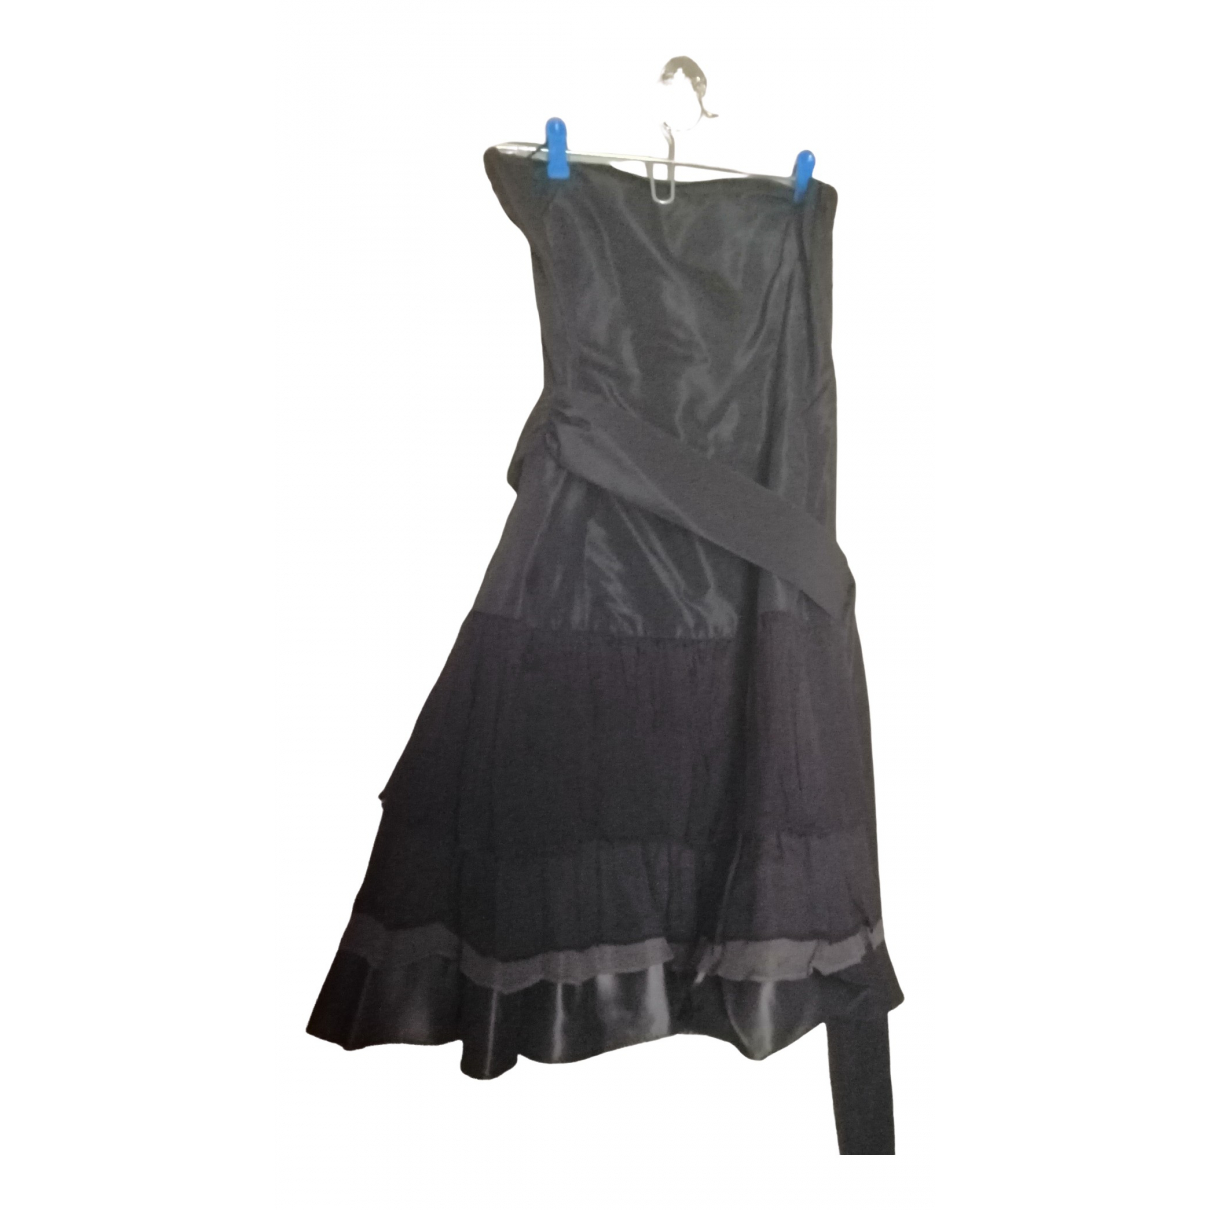 Zara \N Anthracite dress for Women L International